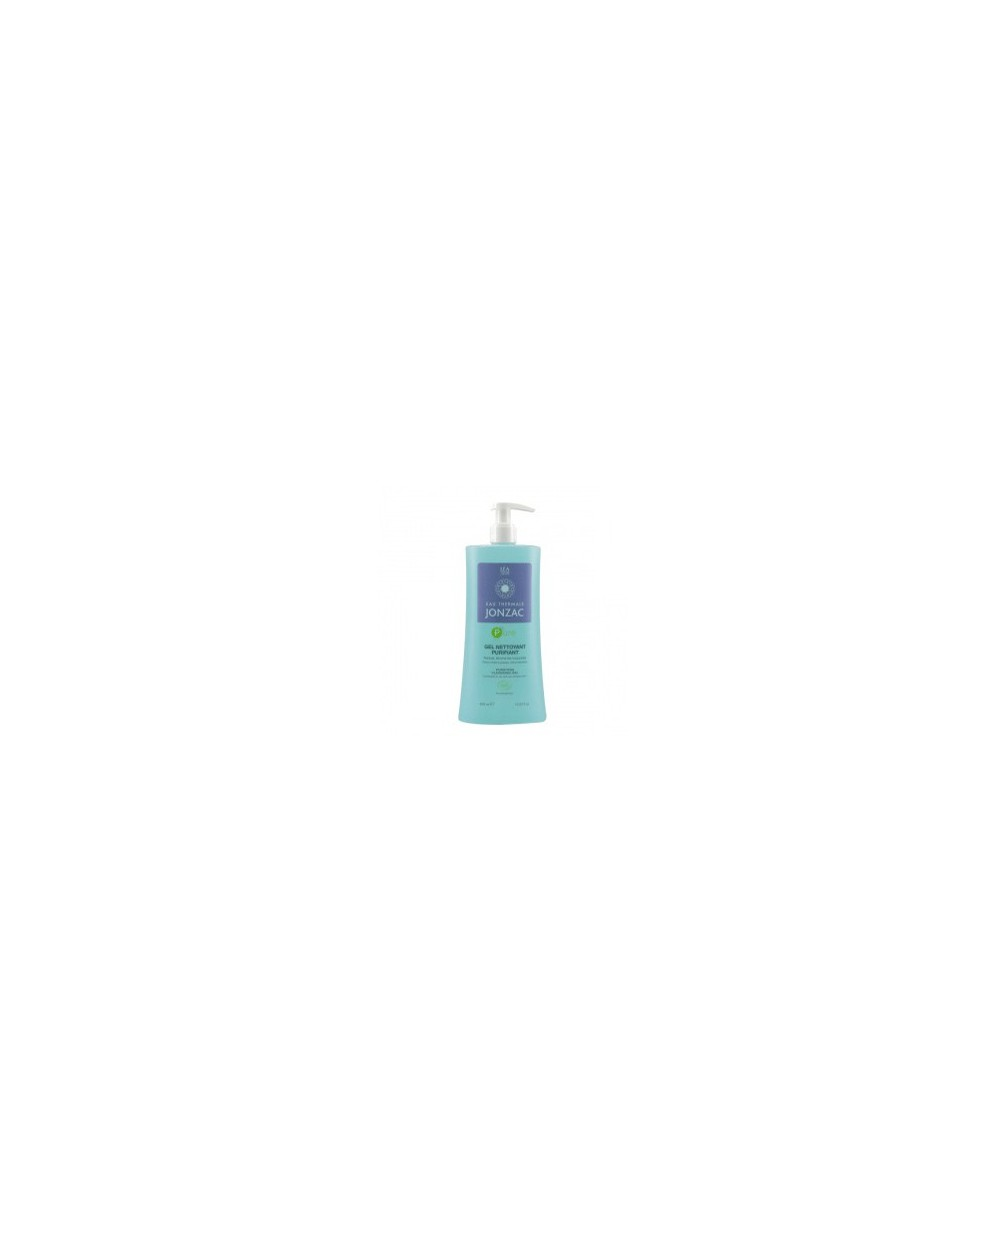 Eau Thermale Jonzac - PURE - Gel detergente purificante